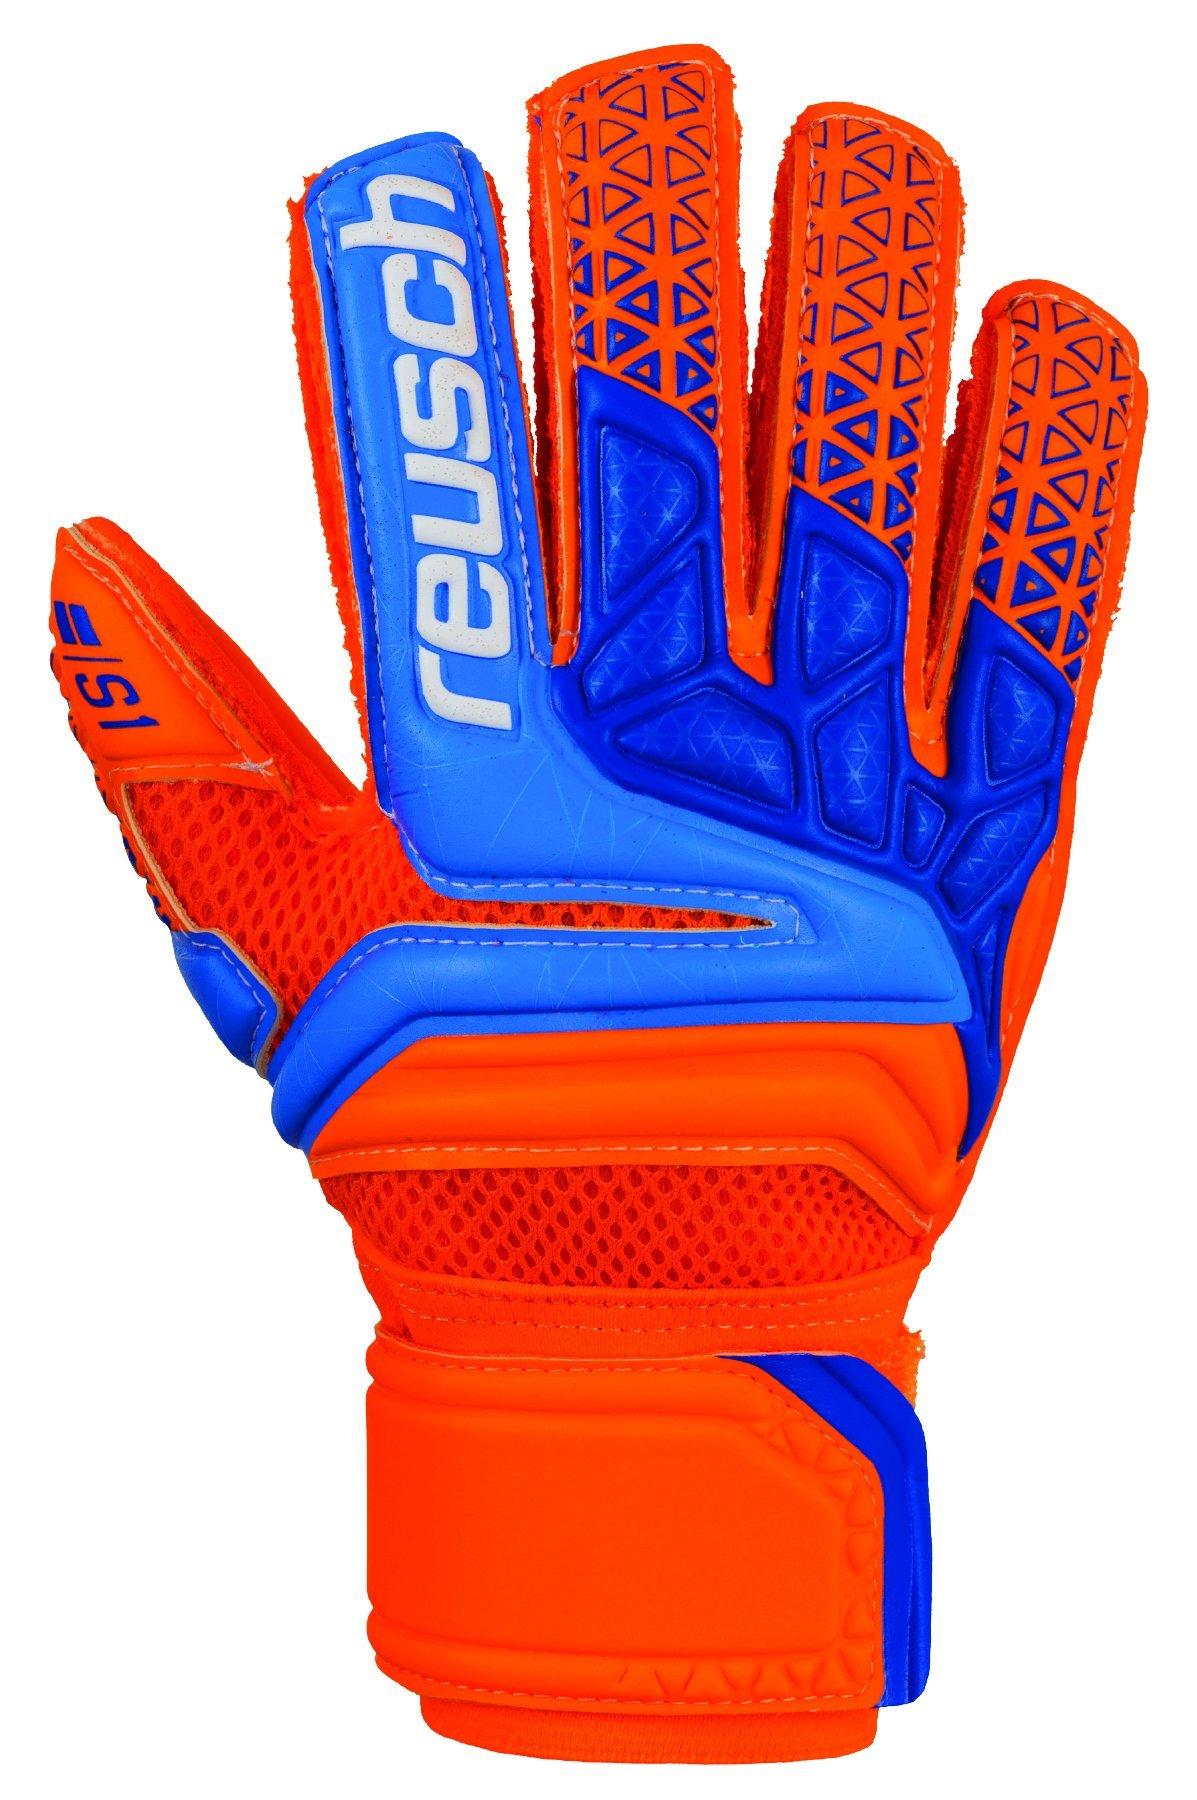 Reusch Soccer Prisma STF S1 Finger Support Goalkeeper Gloves, Size 7, Orange/Blue